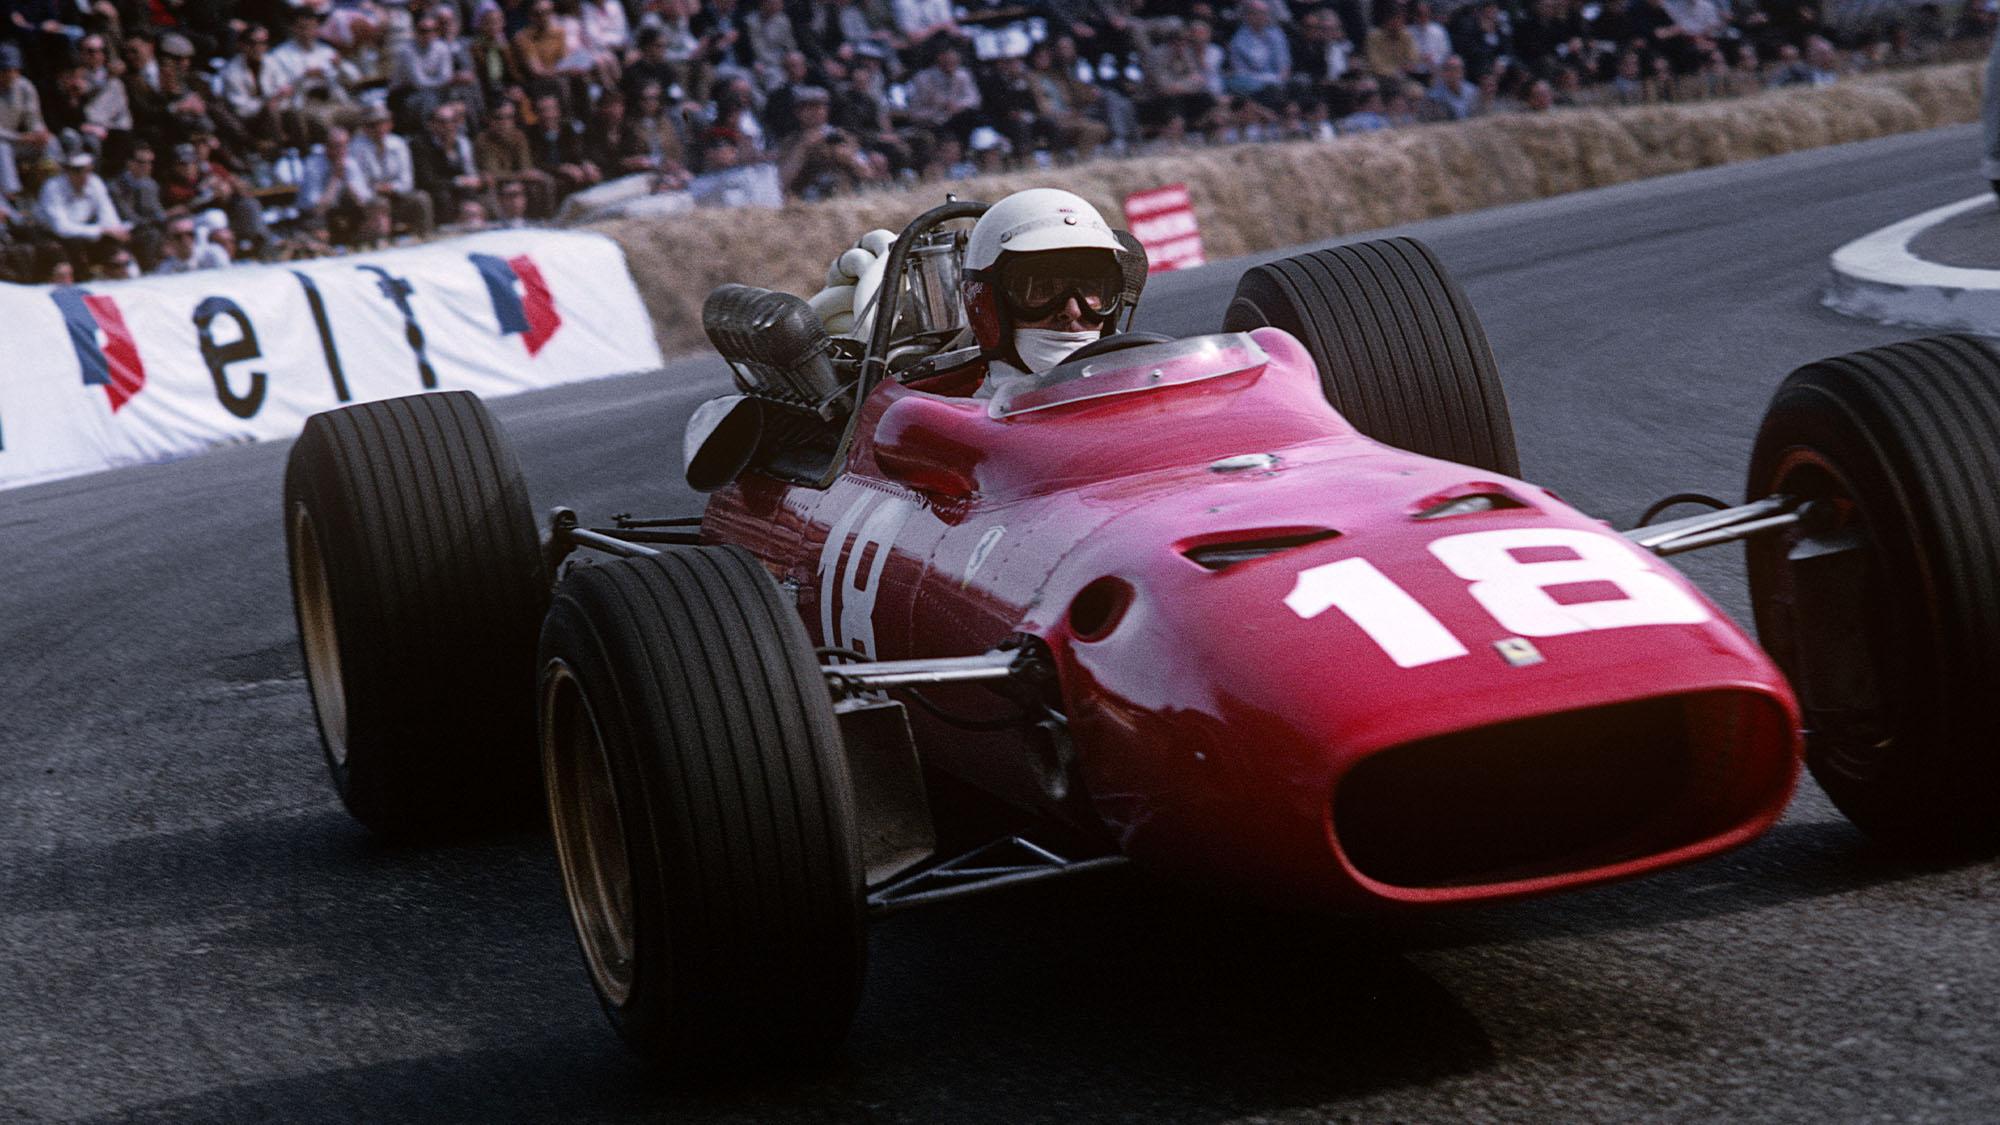 Lorenzo Bandini, Ferrari 312, Grand Prix of Monaco, Circuit de Monaco, 05 July 1966. (Photo by Bernard Cahier/Getty Images)